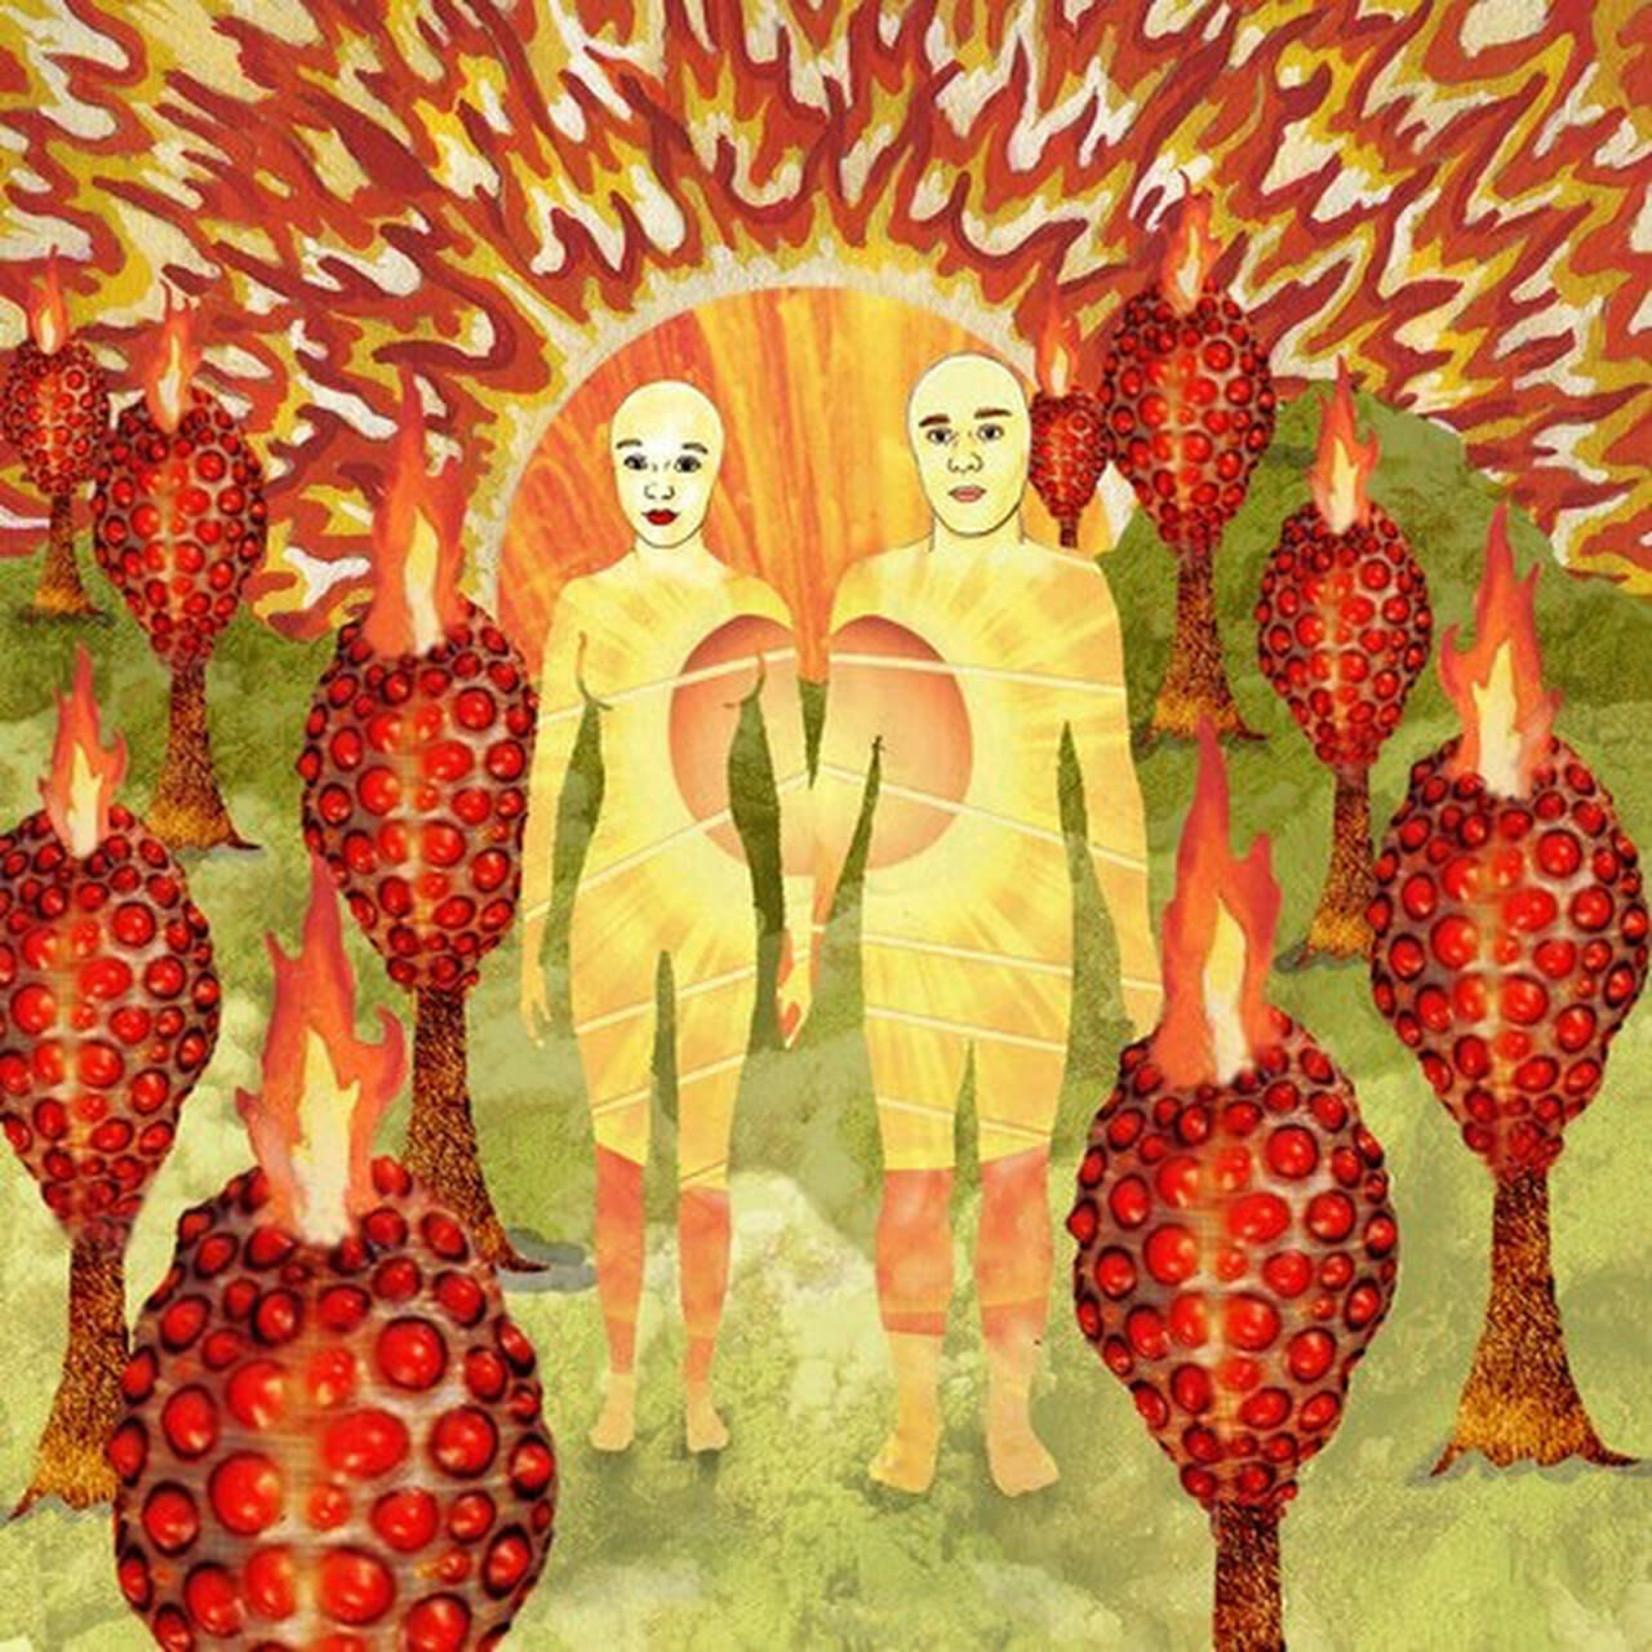 [New] Of Montreal: The Sunlandic Twins (LP+12'', red & orange swirl)